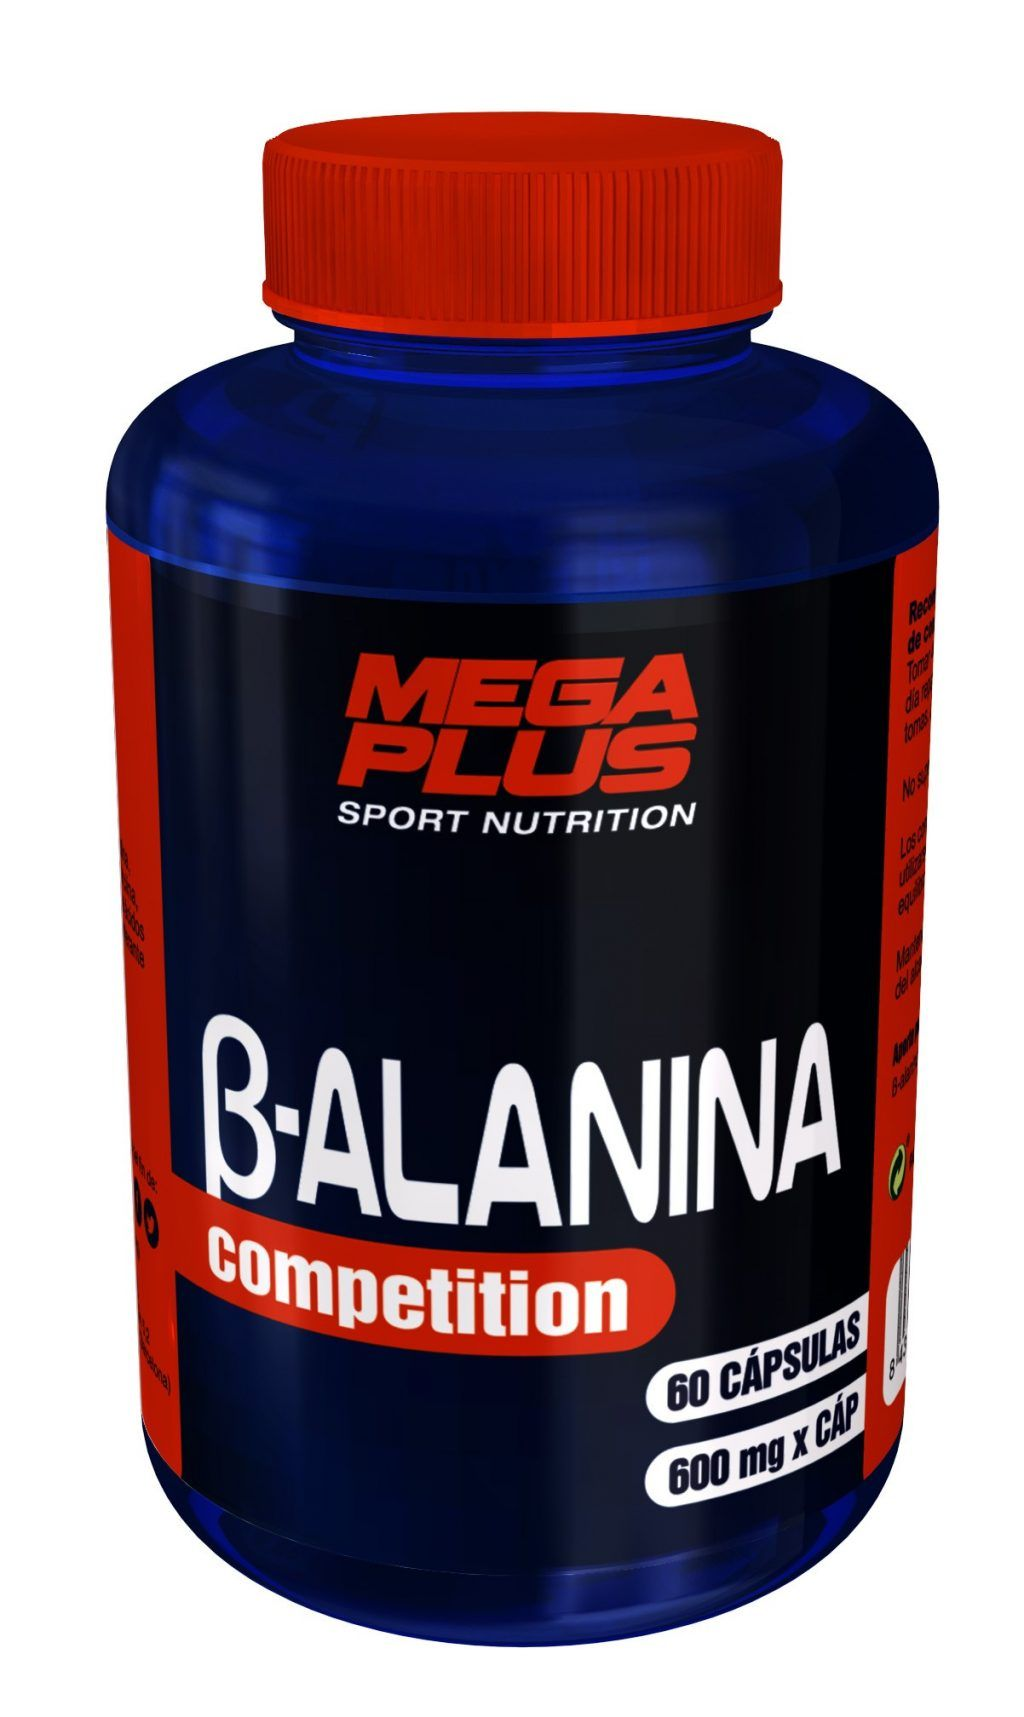 B-ALANINA 60 CAPS. MEGAPLUS